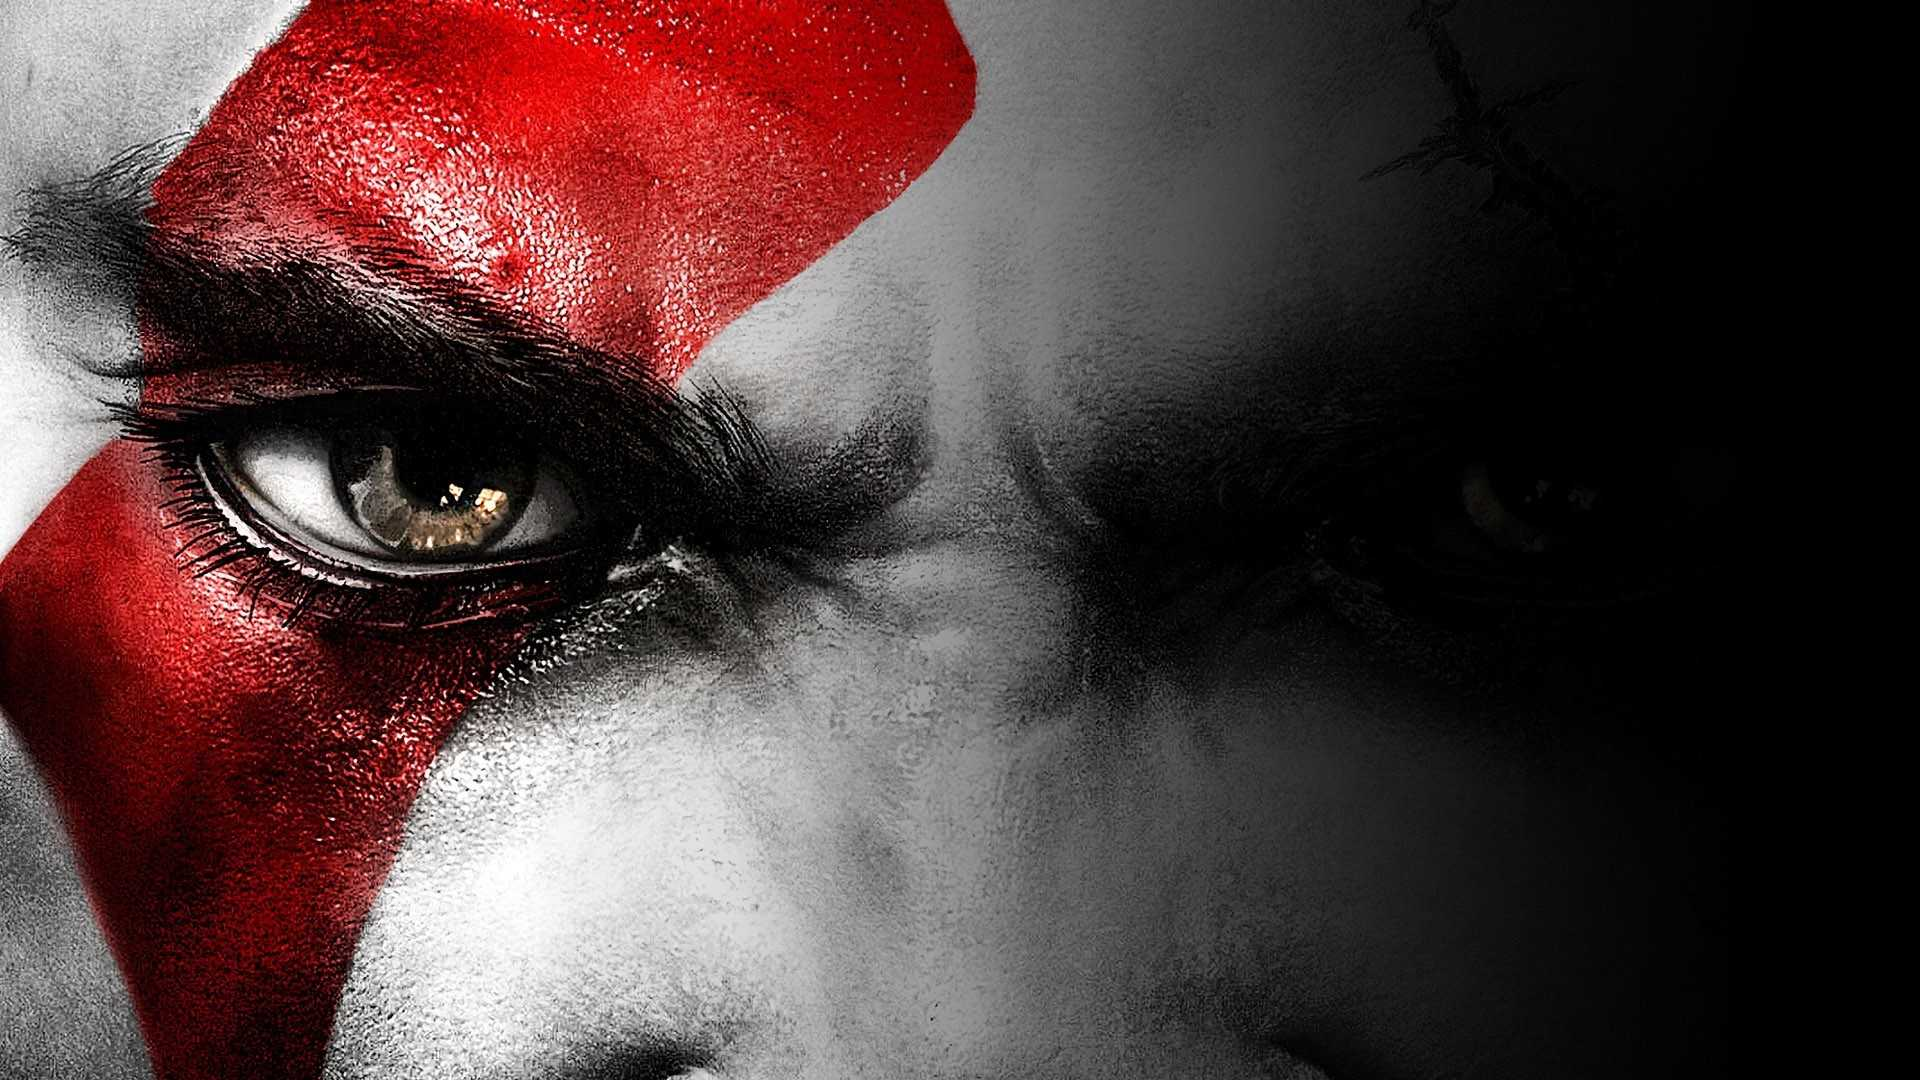 VRCMods - Kratos - VRChat Avatars